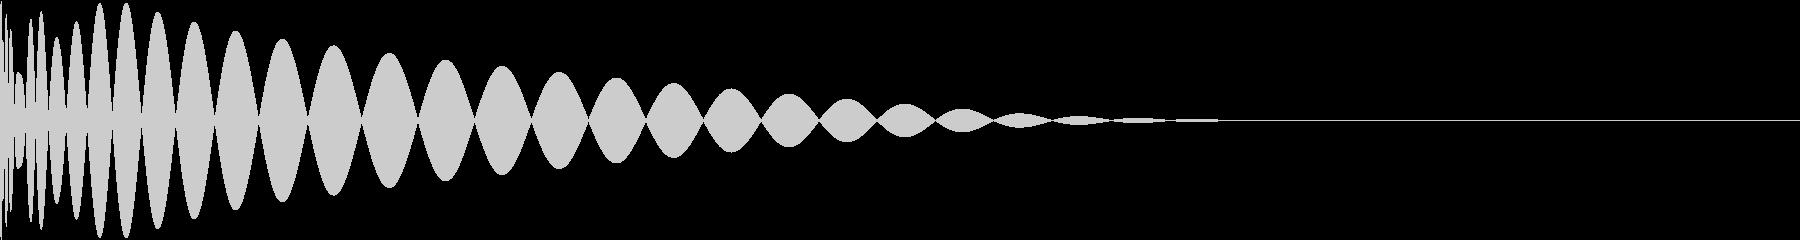 DTM Kick 69 オリジナル音源の未再生の波形